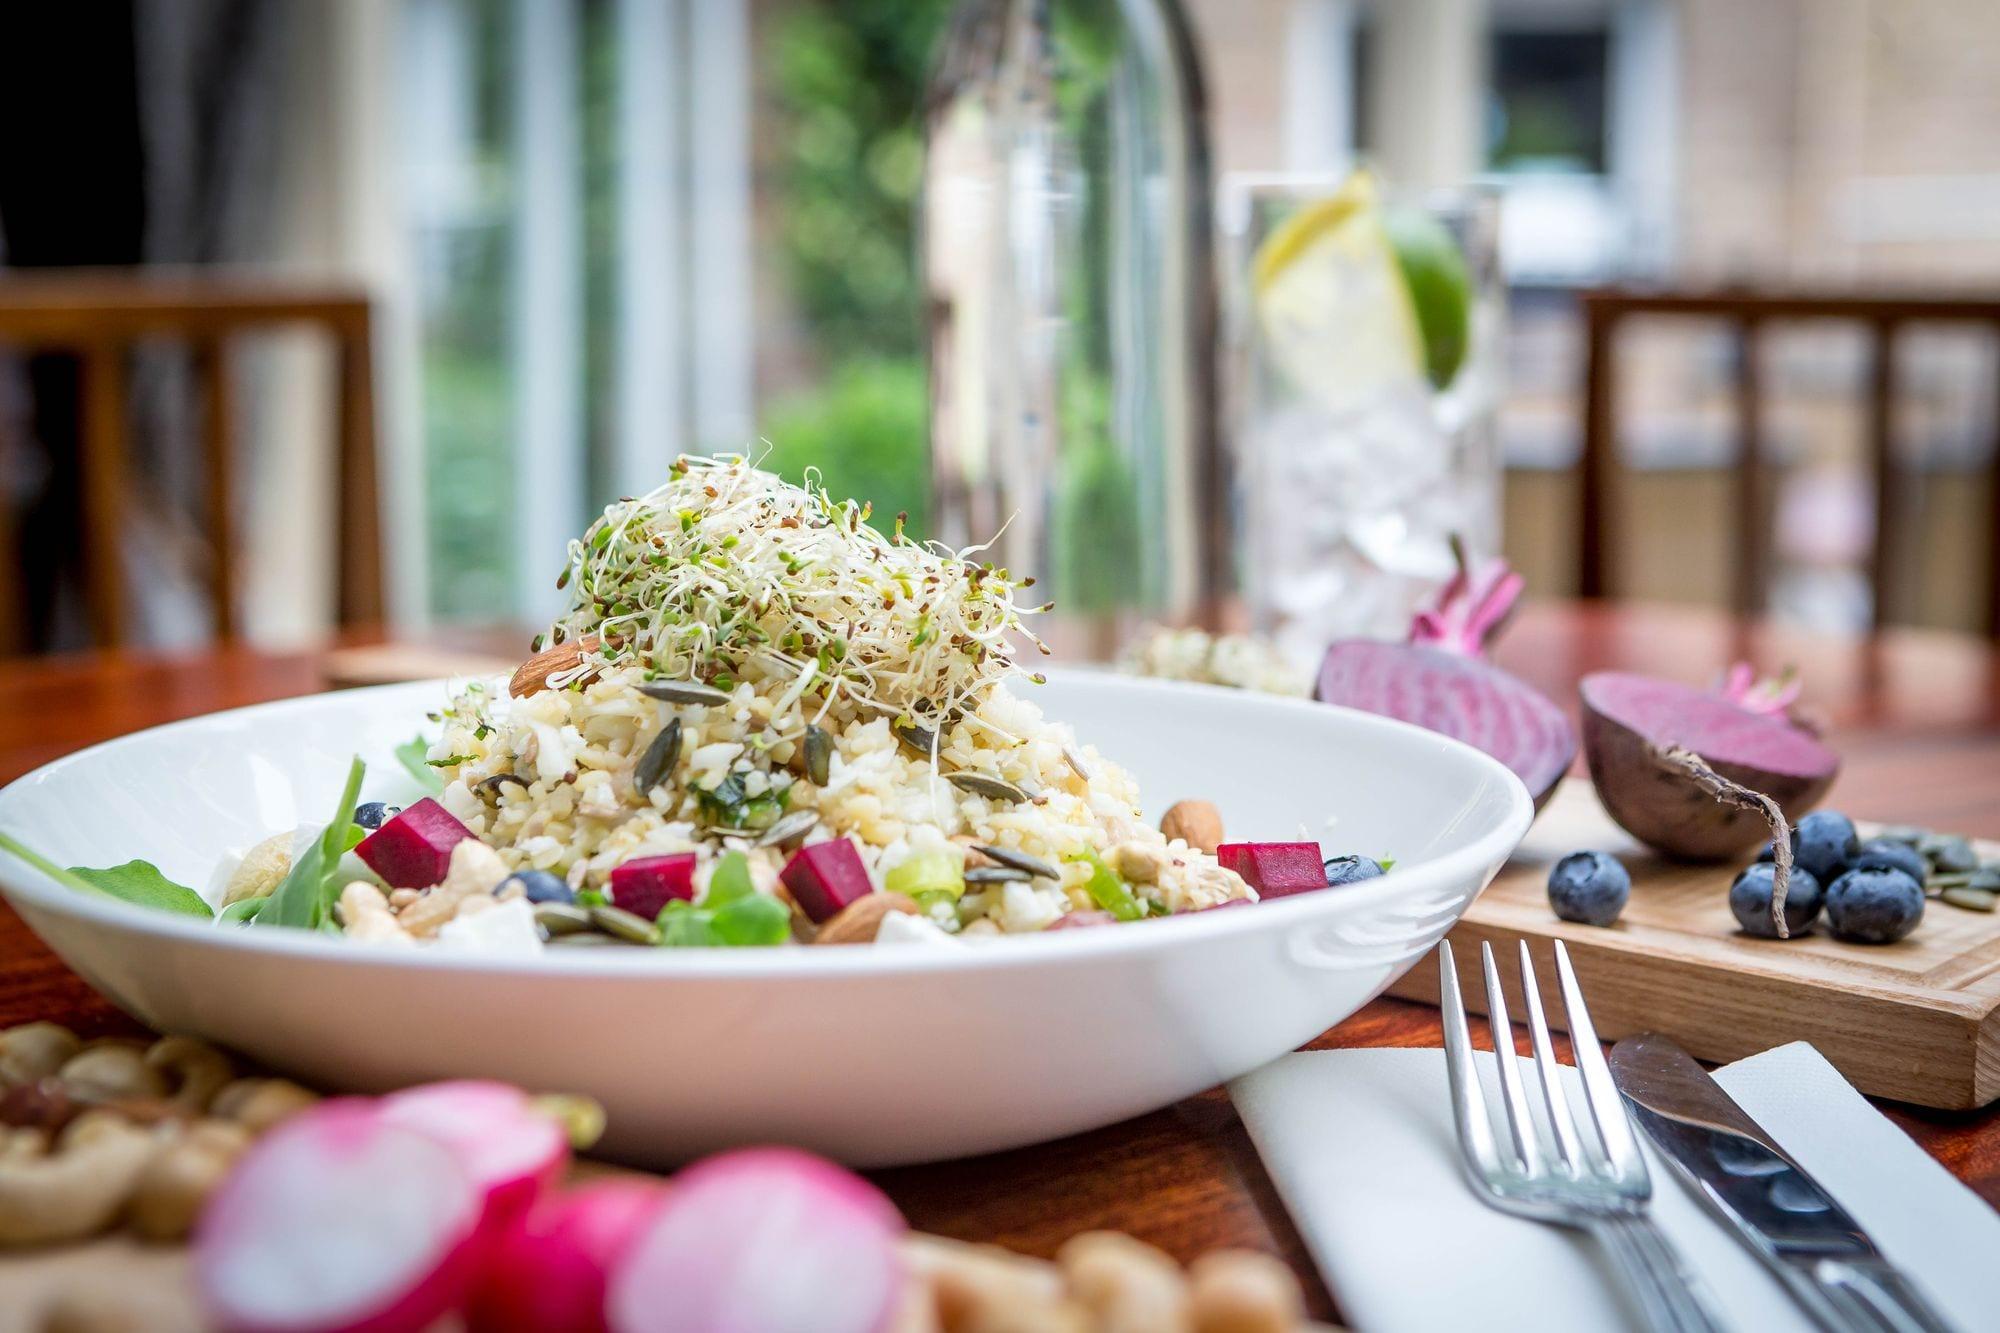 Superfood salad served at Clayton Hotel Liffey Valley